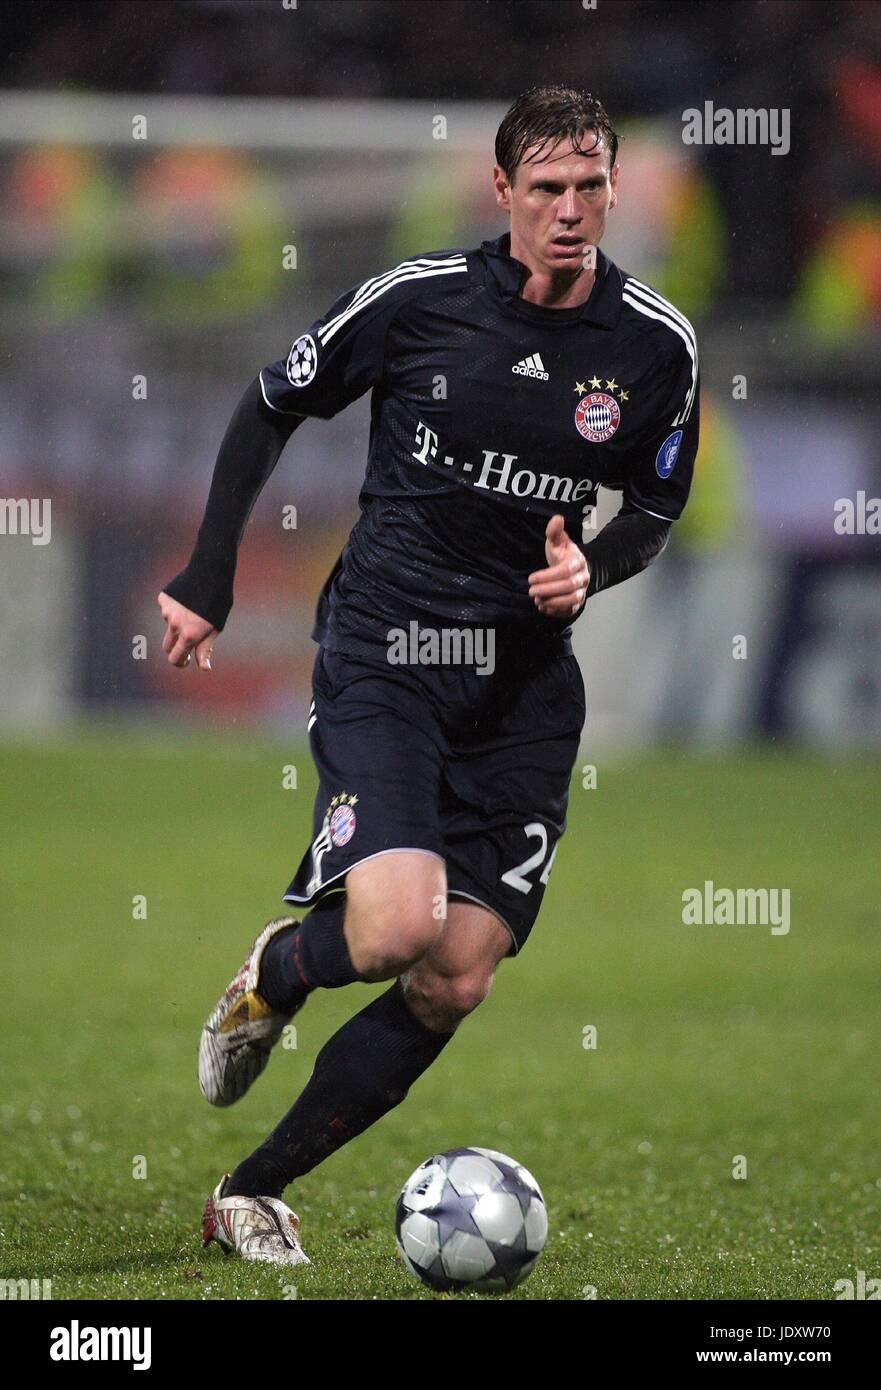 Tim Borowski Fc Bayern München Stade De Gerland Lyon